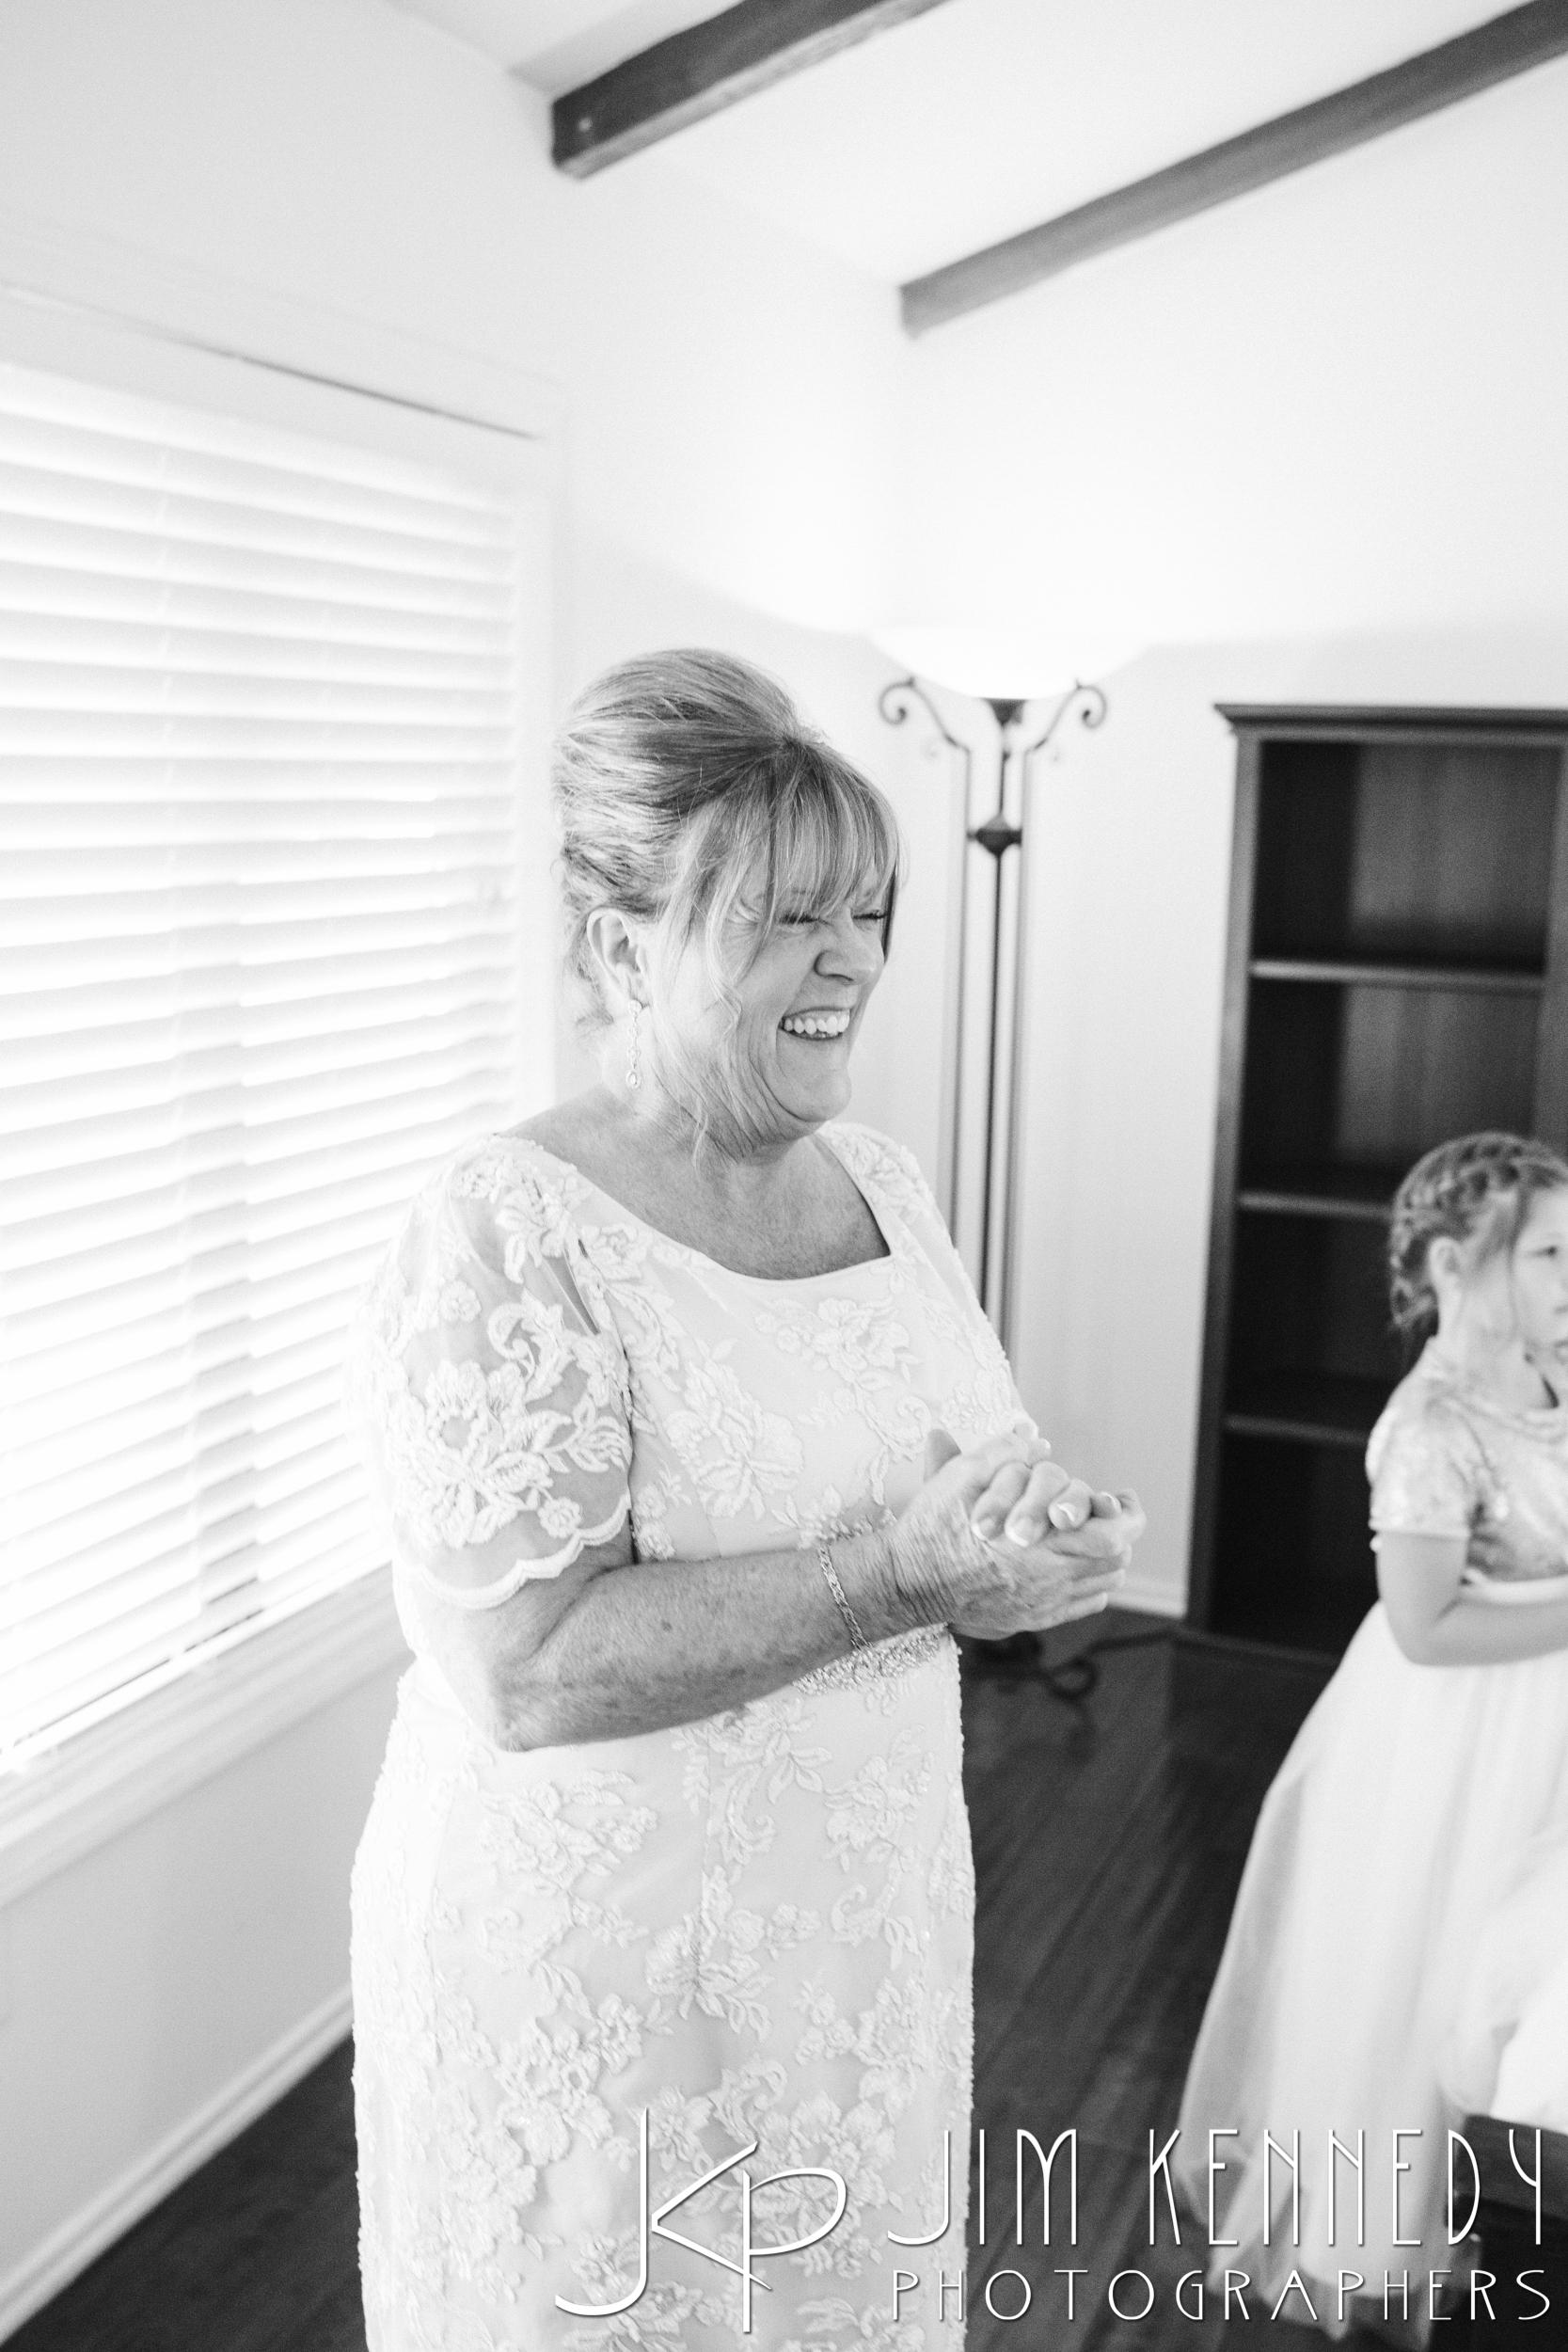 jim_kennedy_photographers_highland_springs_wedding_caitlyn_0044.jpg